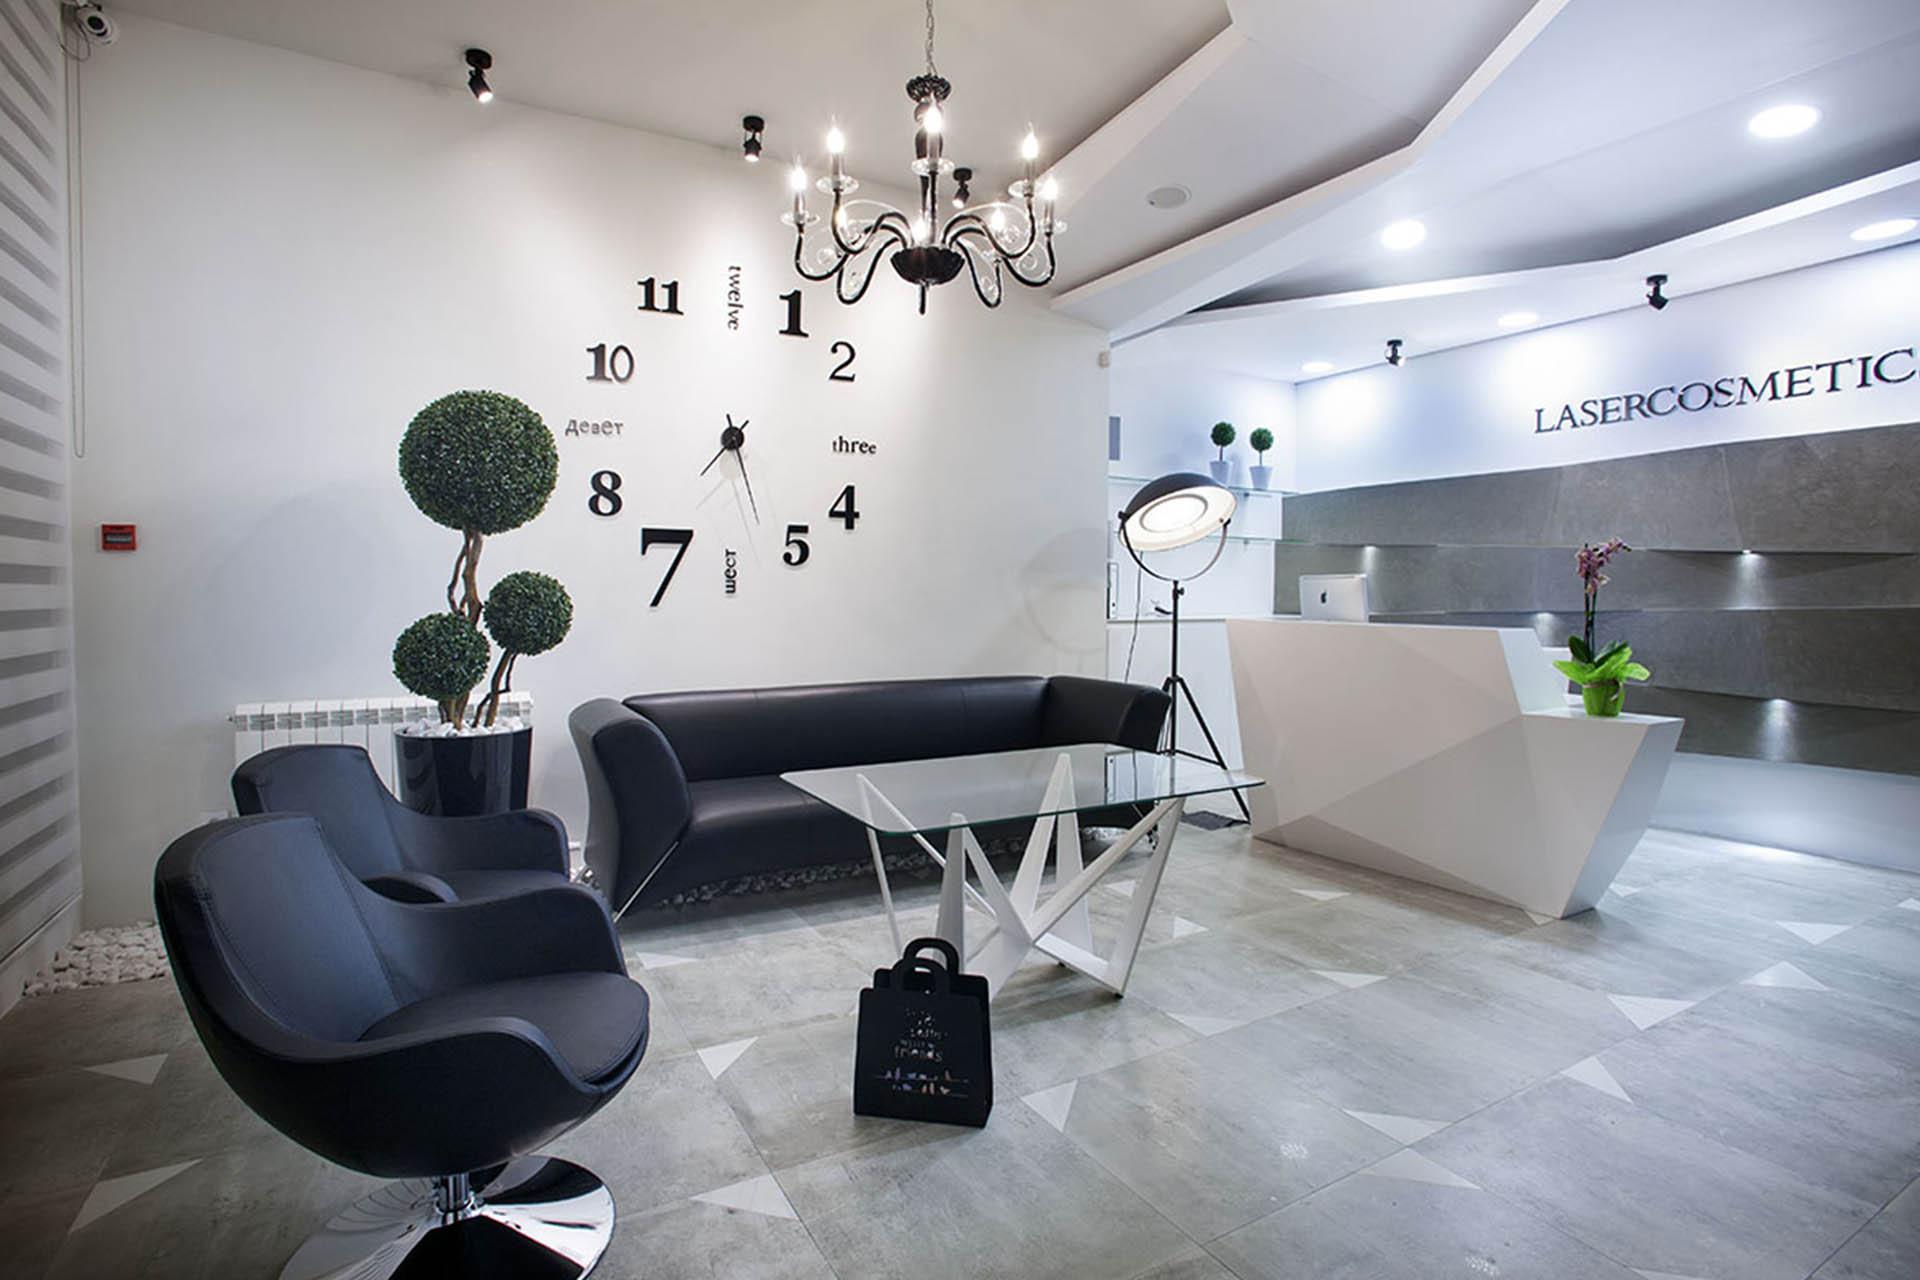 XYLON | Dizajn enterijera i nameštaja | Salon lepote Laser Cosmetics